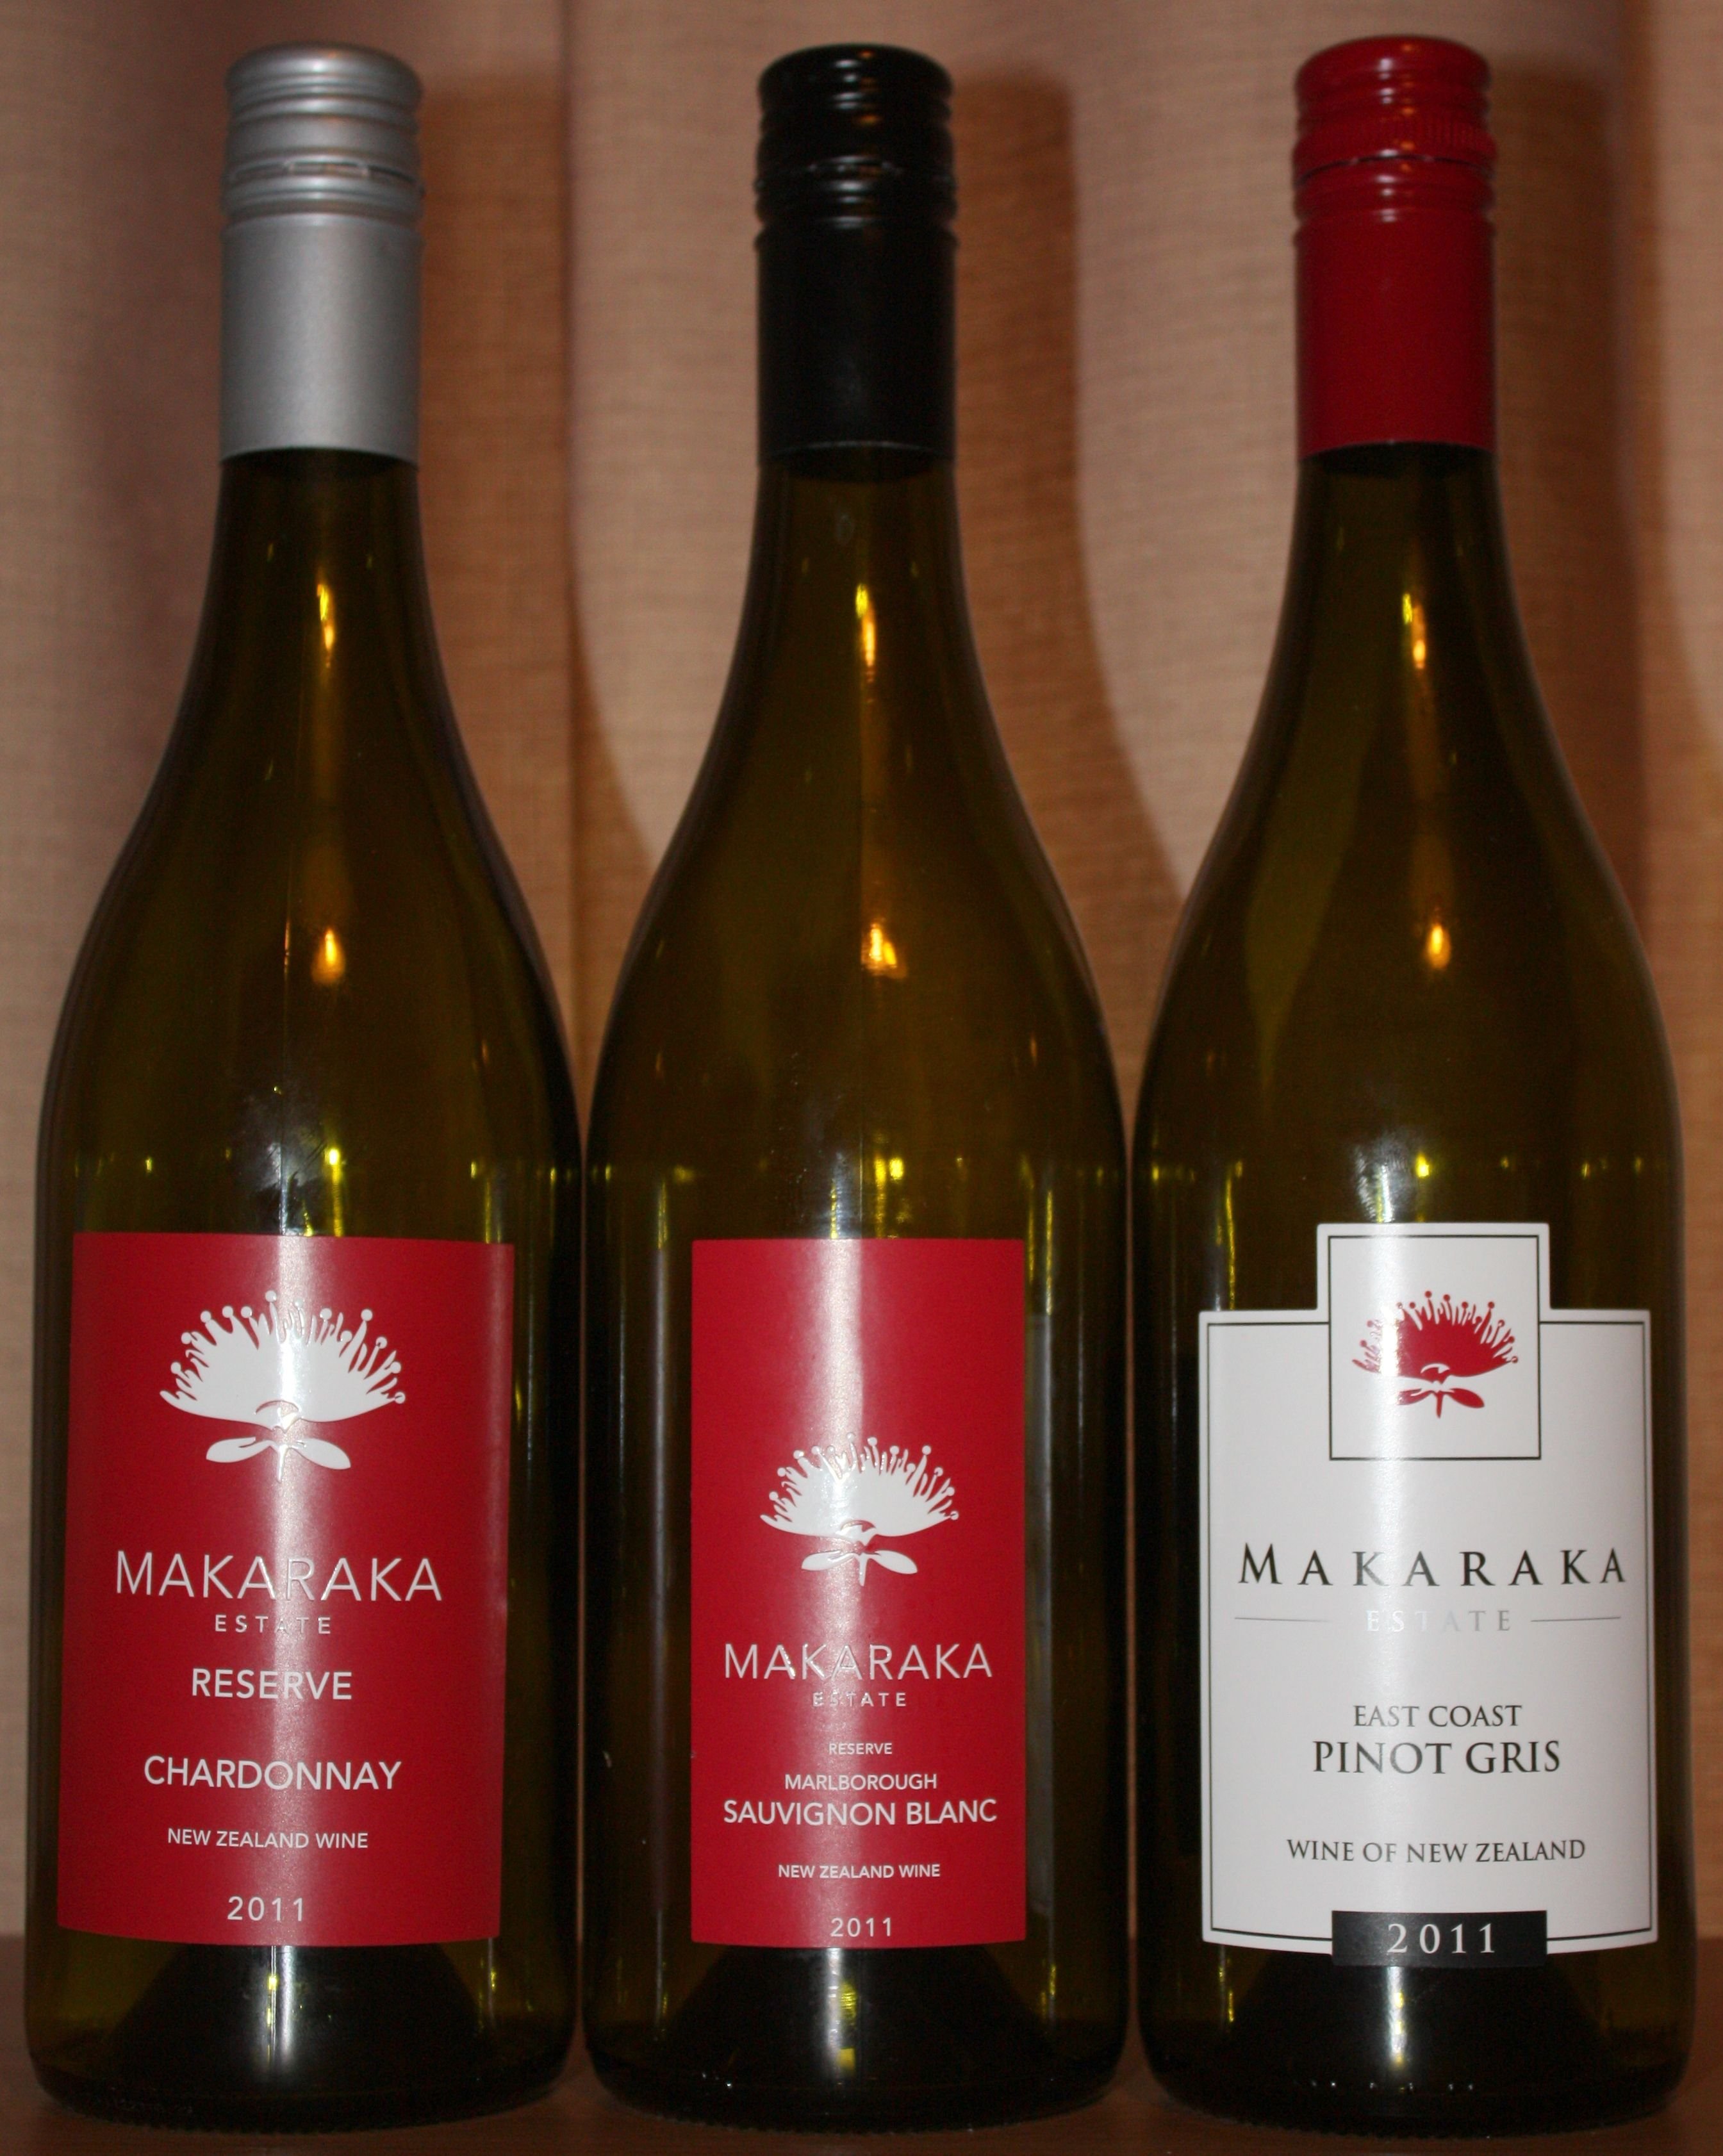 Makaraka Estate Wines New Zealand Wine Sauvignon Blanc Pinot Gris